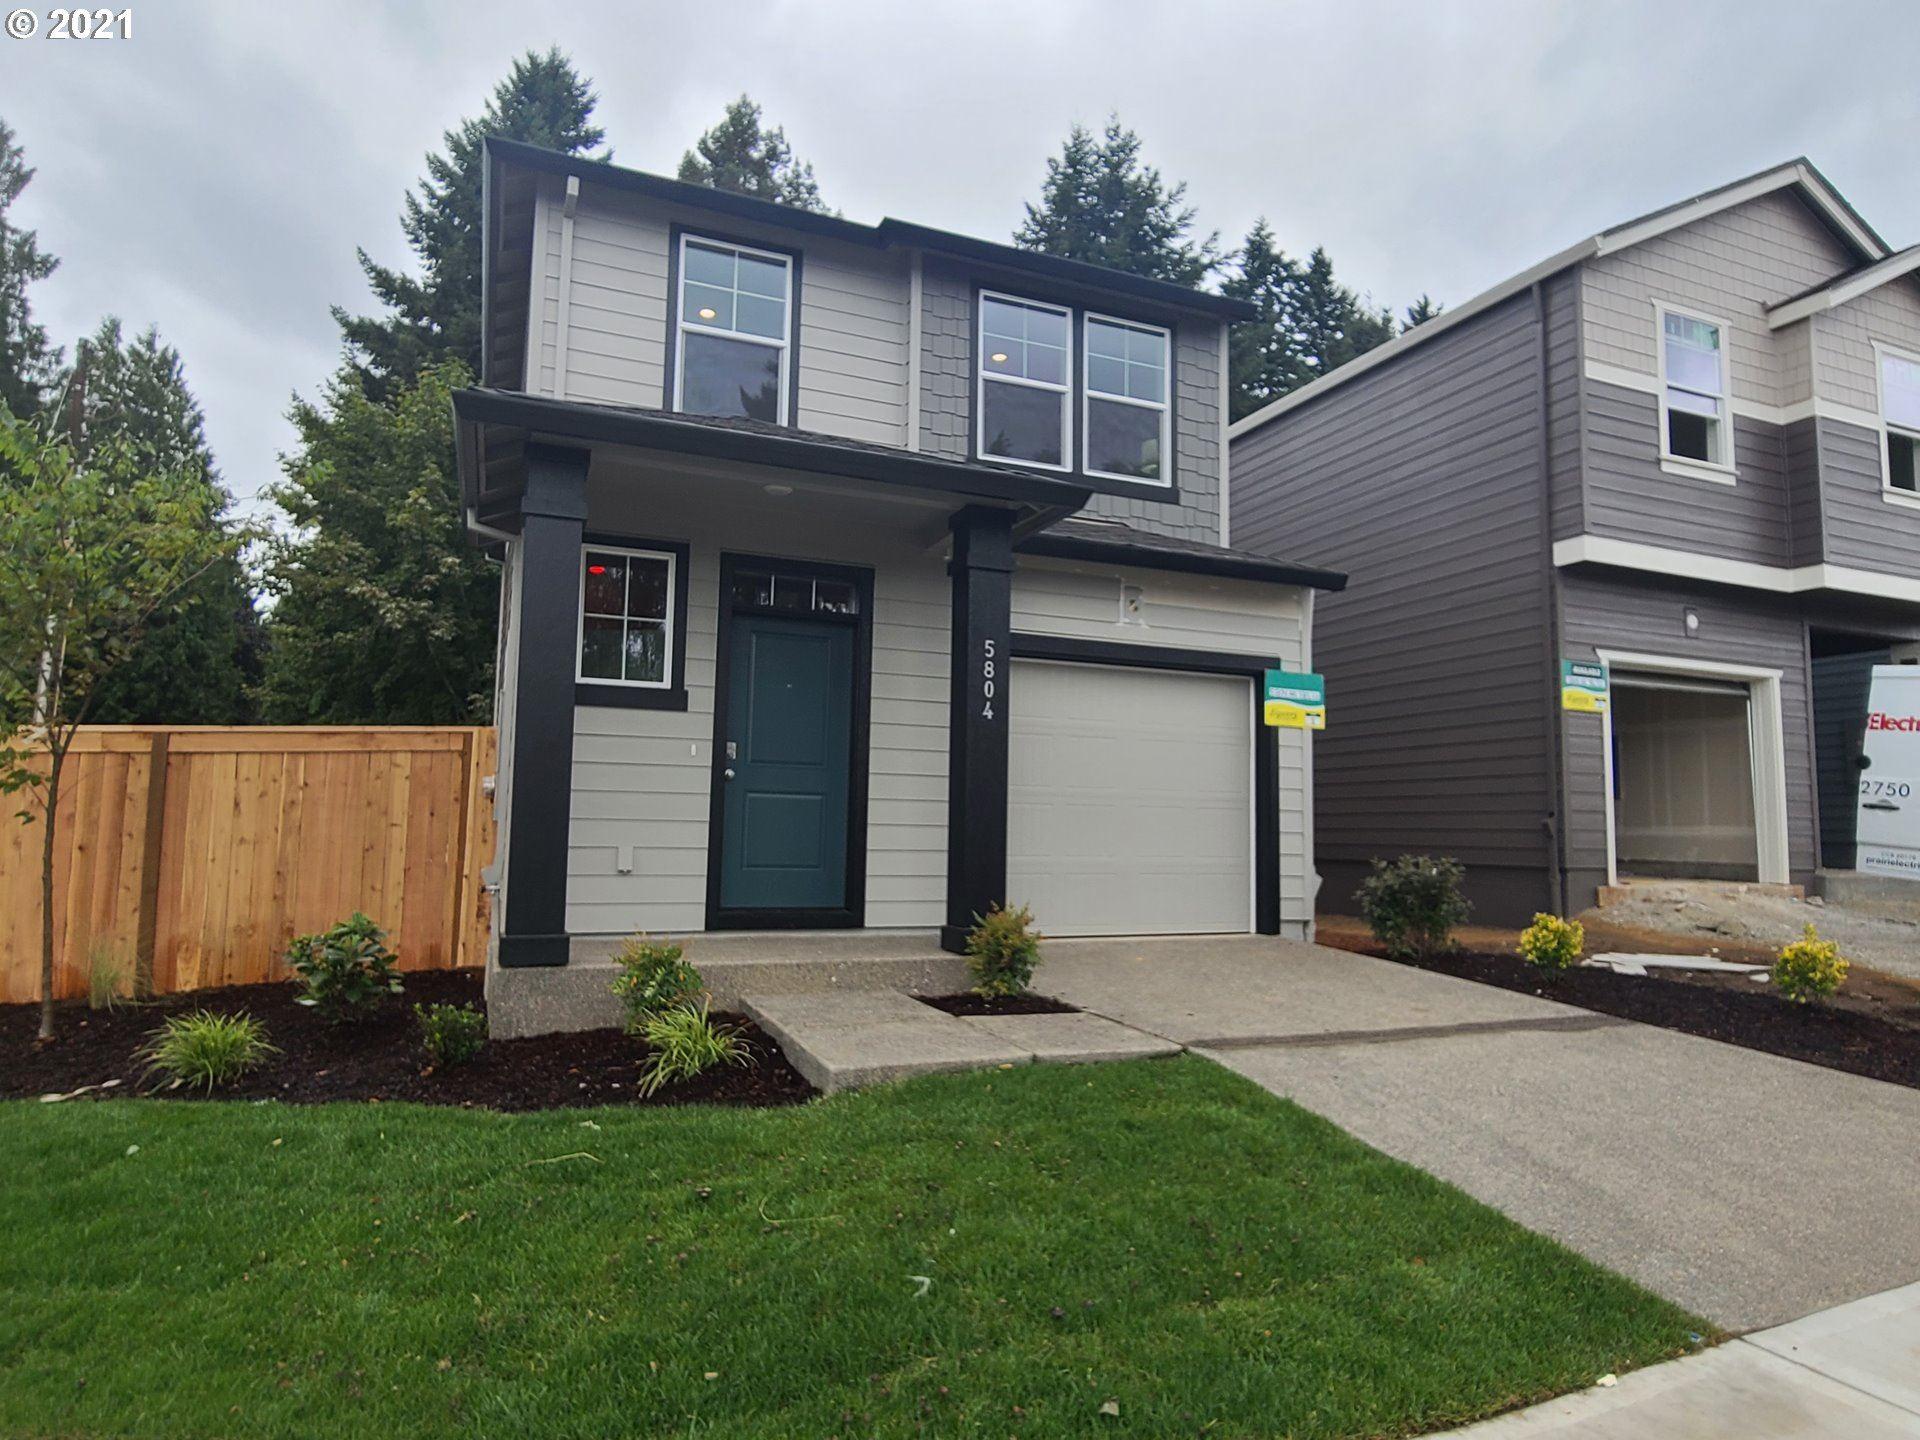 5831 NE 80TH CT, Vancouver, WA 98662 - MLS#: 21615285